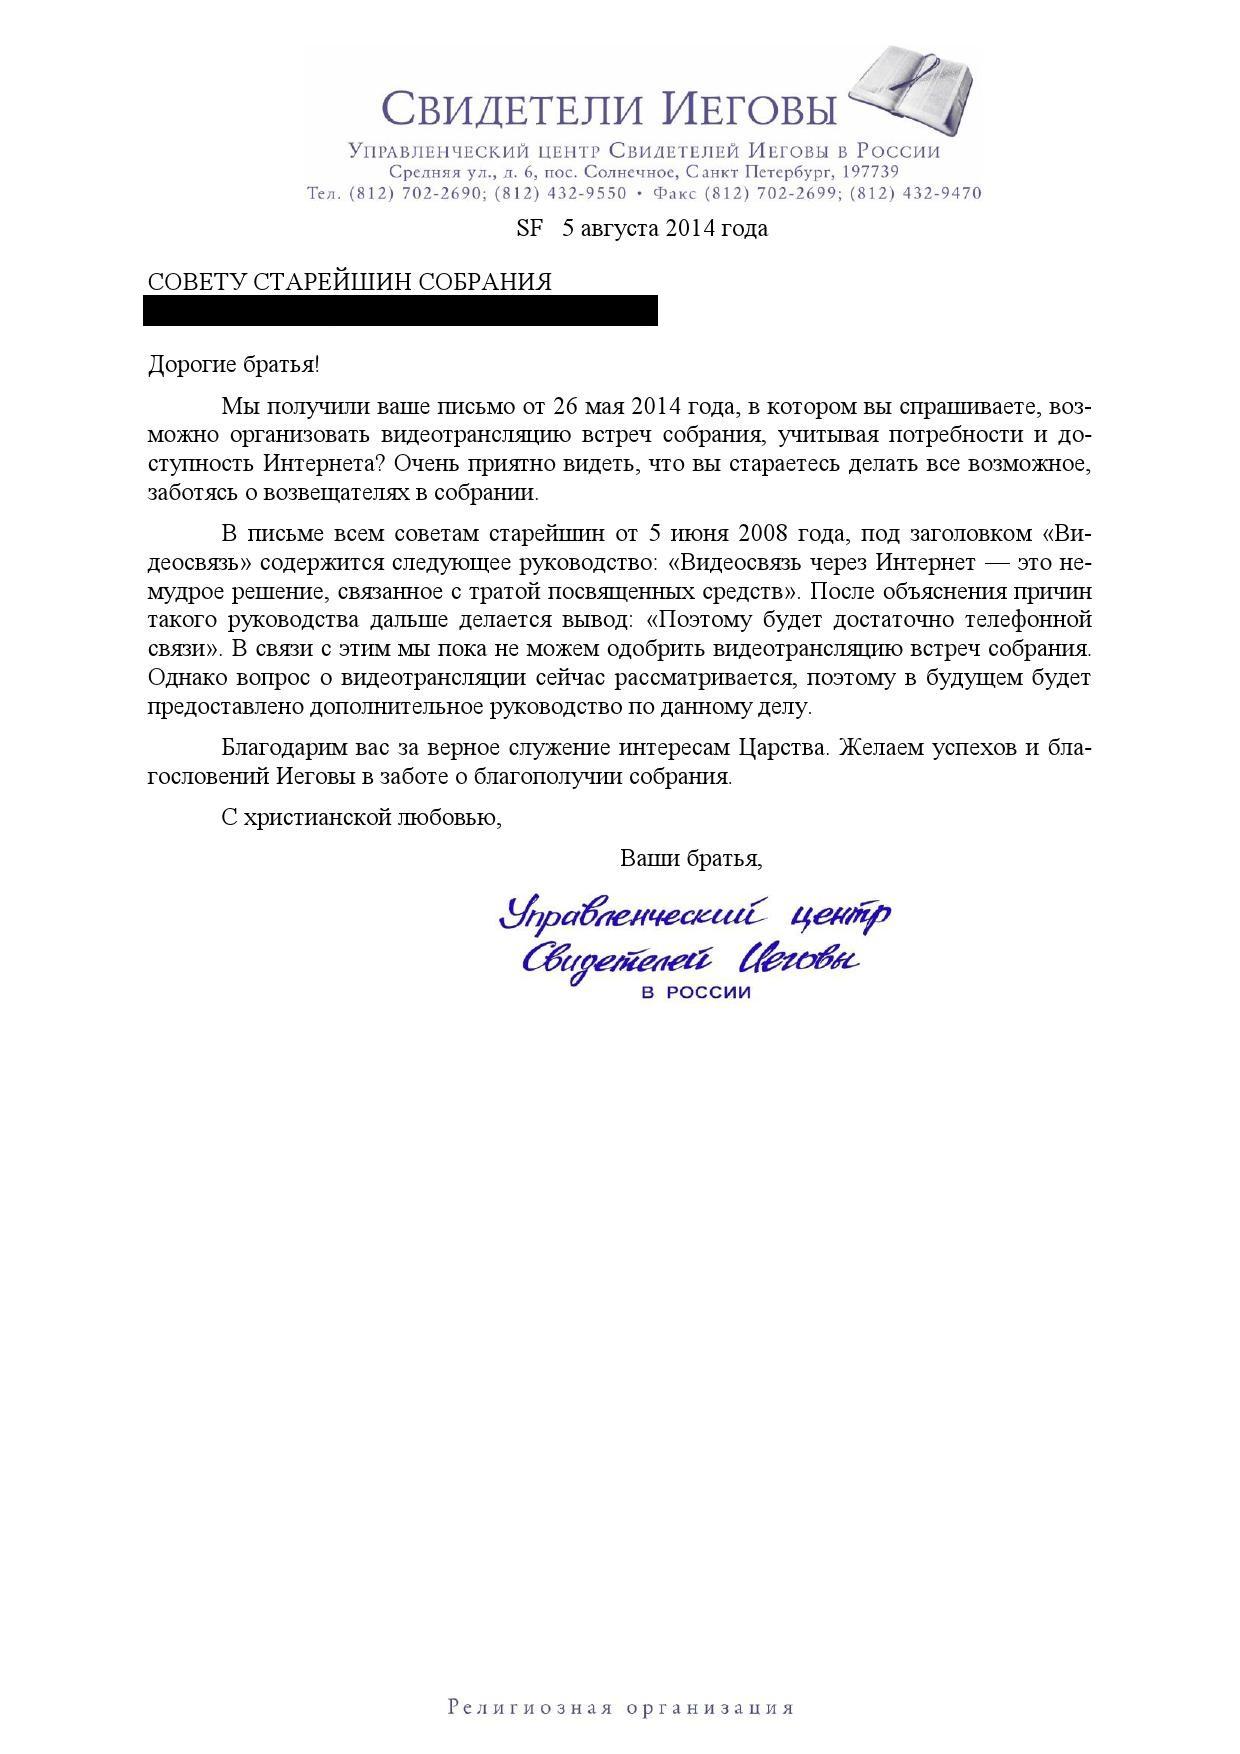 RUS276591 (письмо против видеотрансляций из ЗЦ)_2